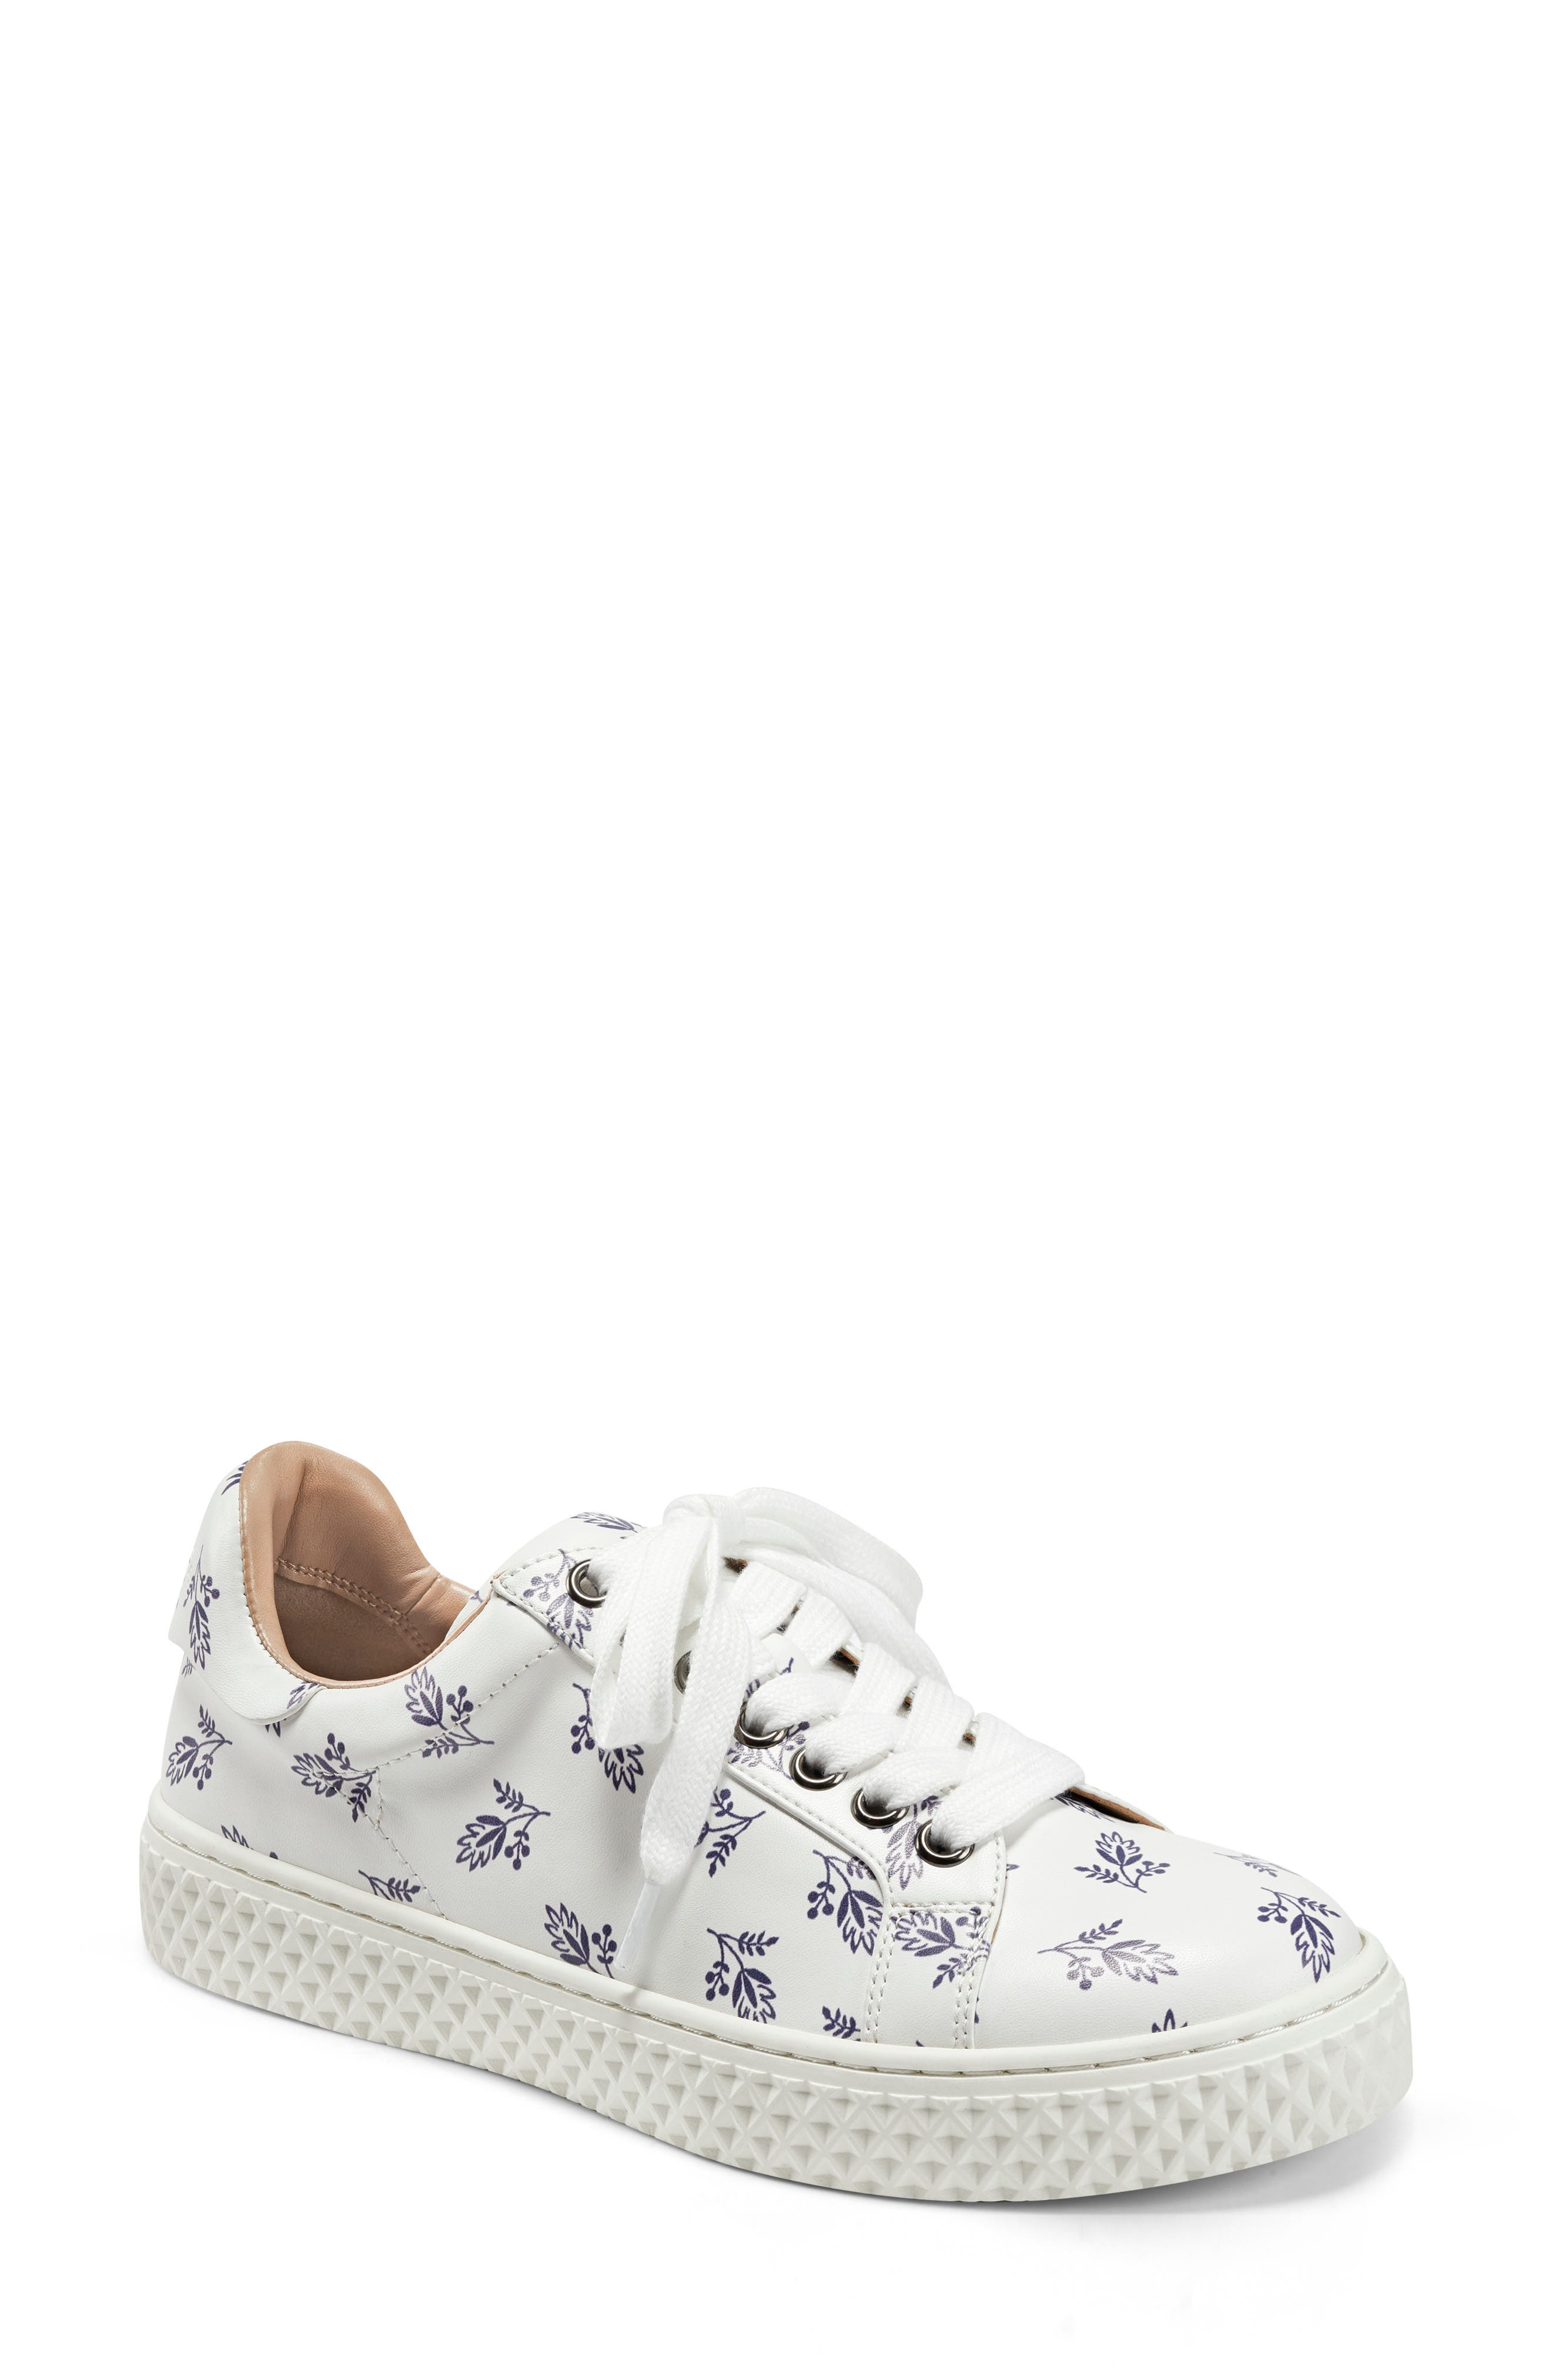 X Laura Ashley La Eve Sneaker